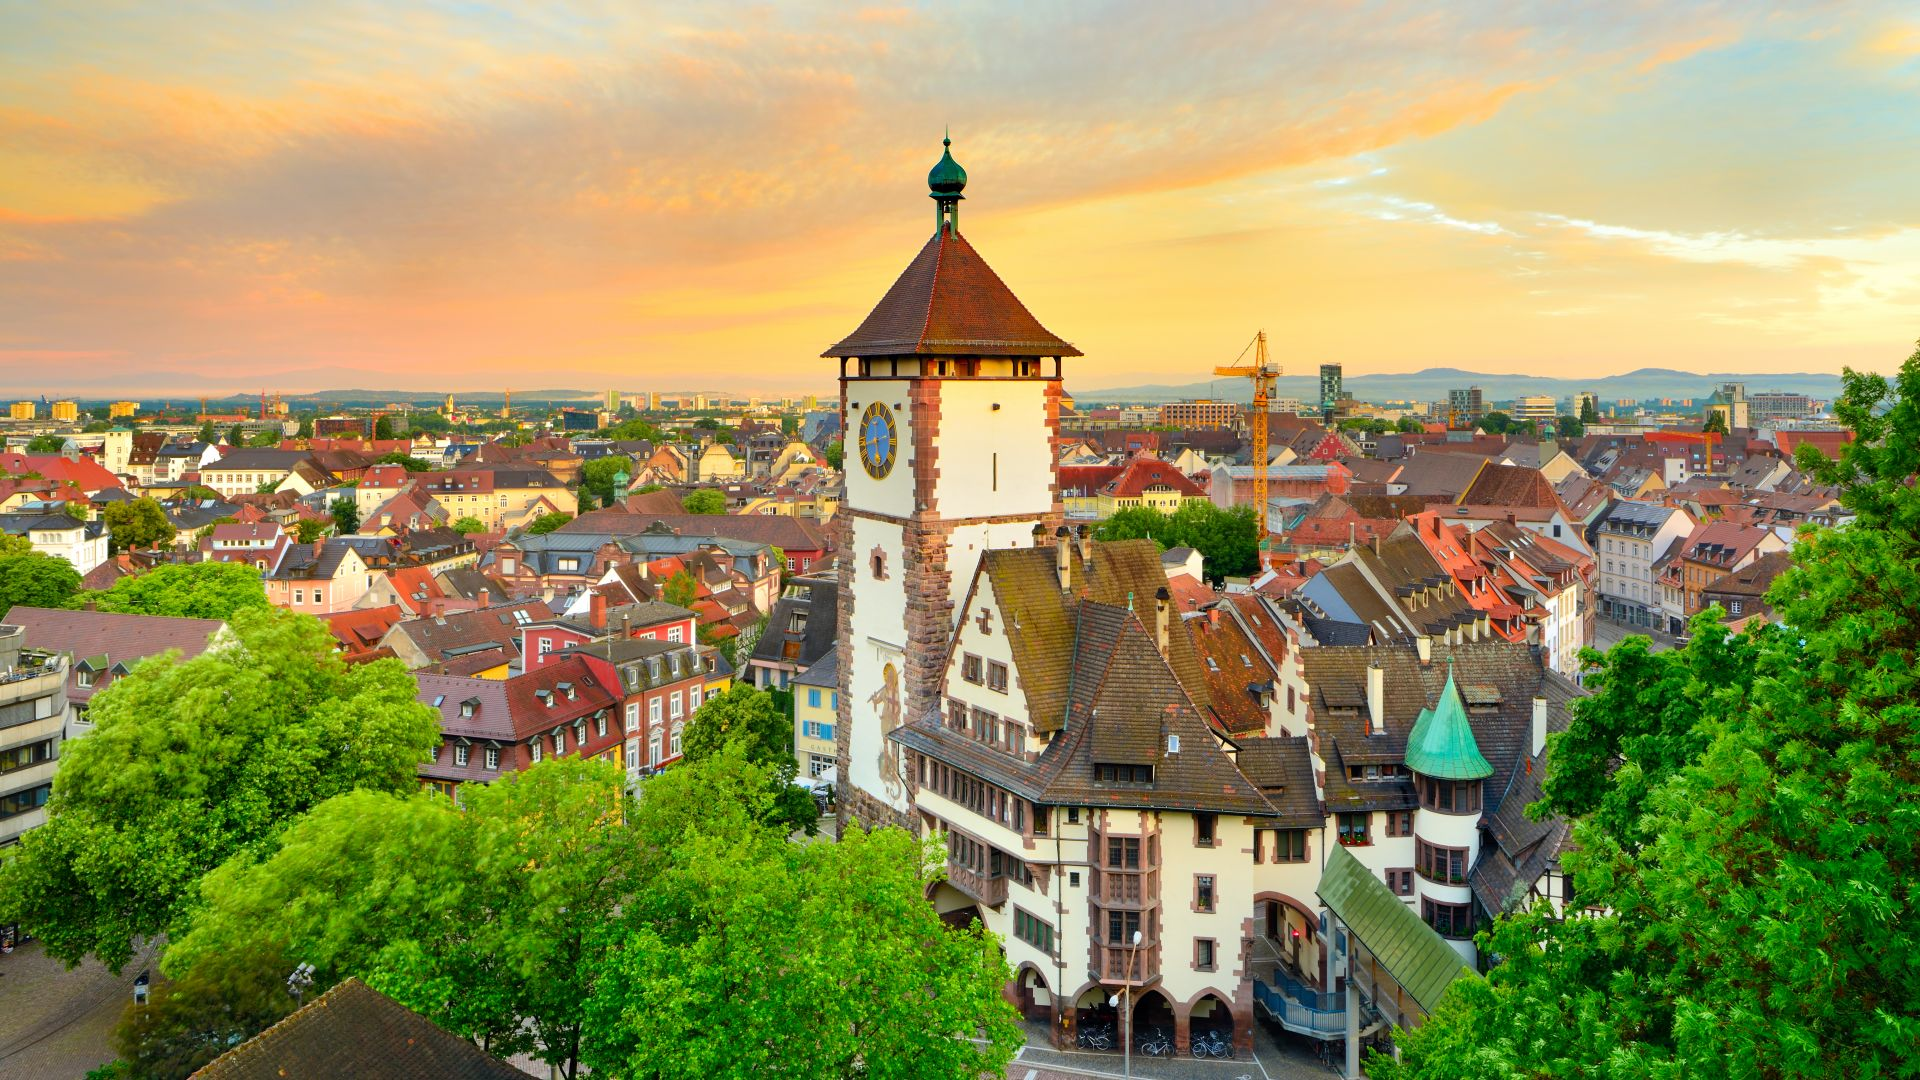 Freiburg im Breisgau: Panoramic view with Schwabentor gate